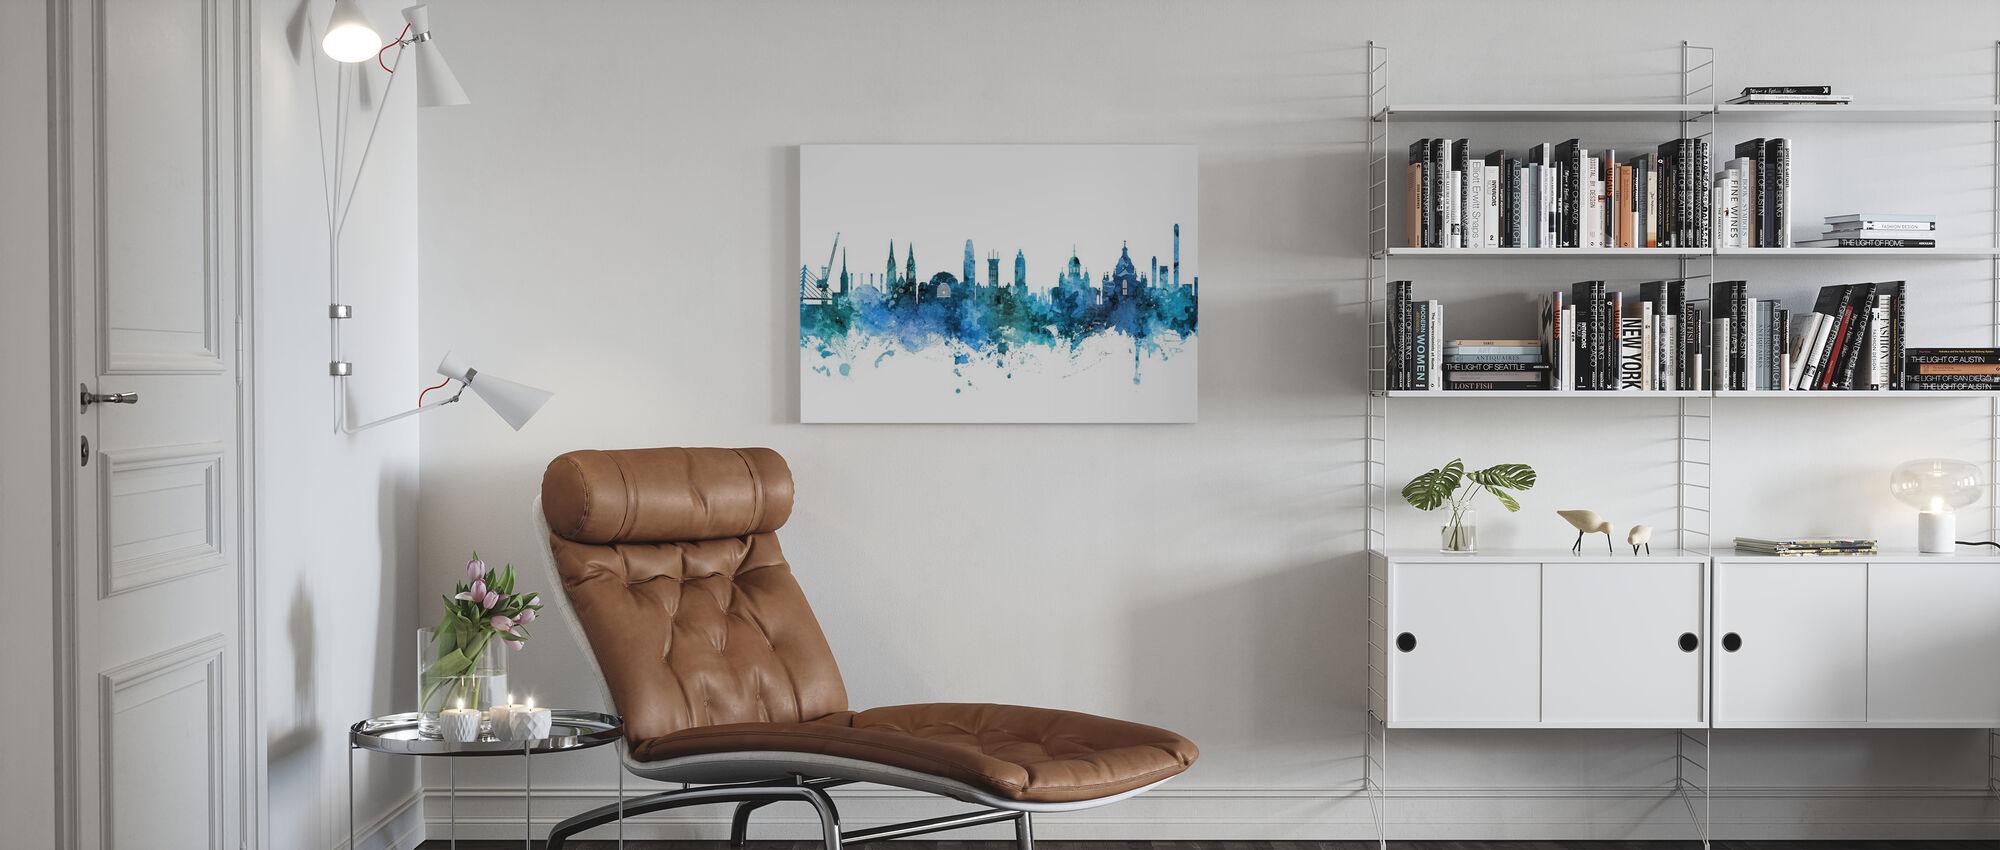 Helsinki Finland Skyline - Canvas print - Living Room